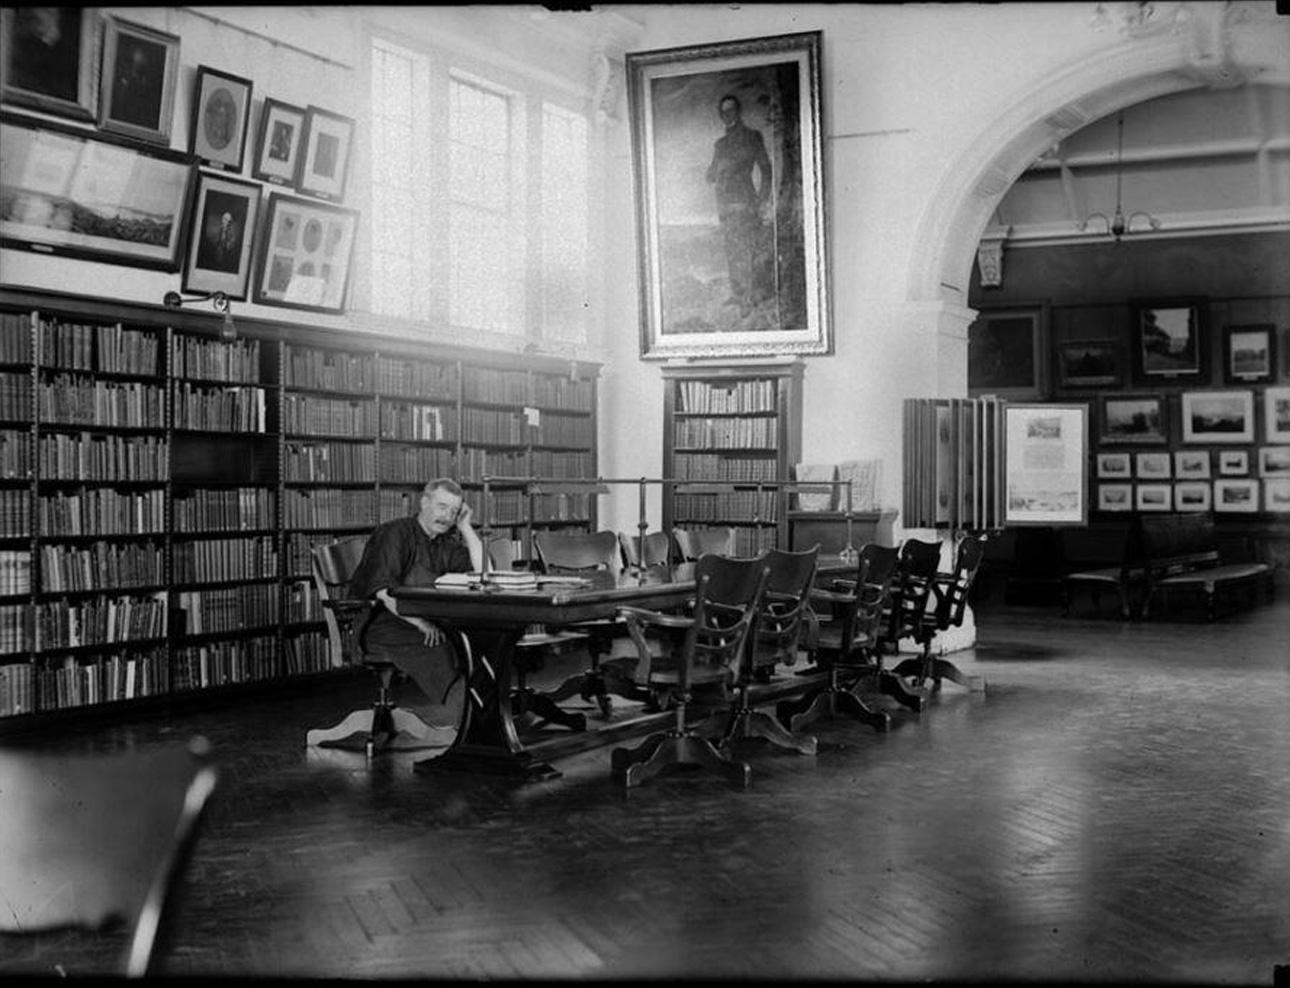 We Love Parquet Mitchell Reading Room